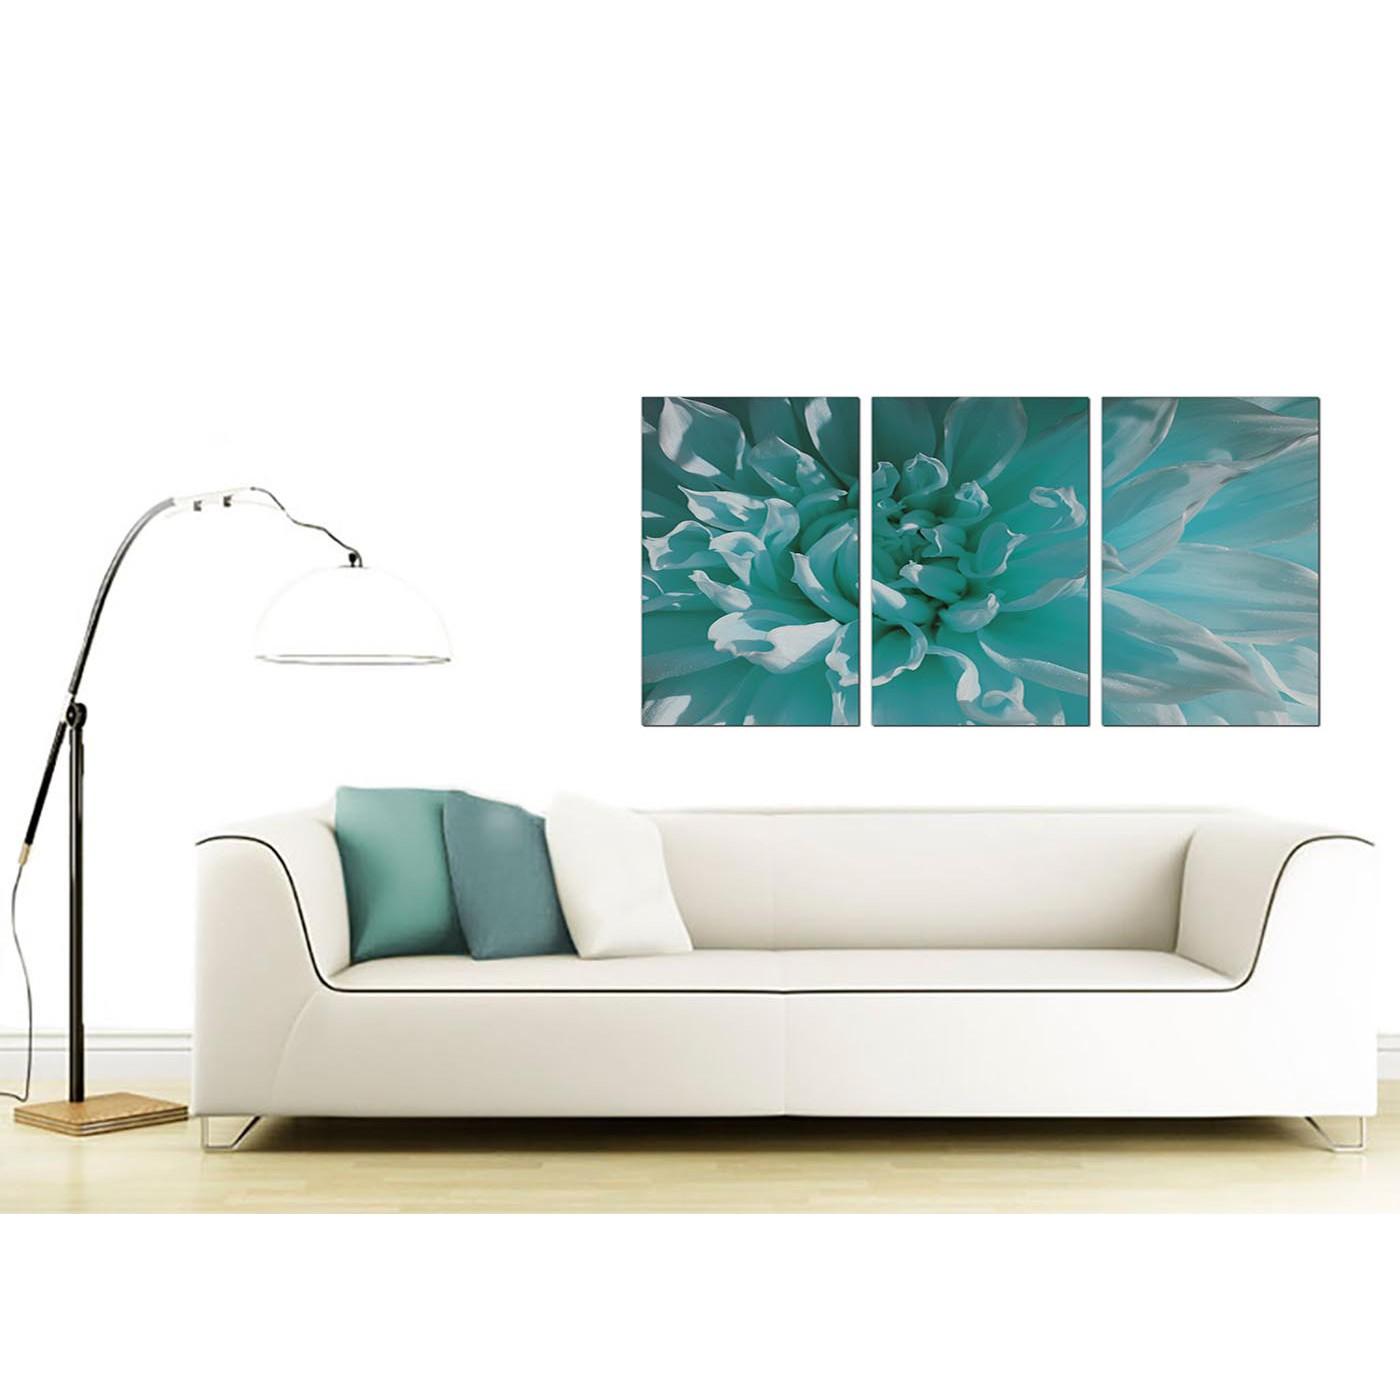 Display Gallery Item 4 Set Of 3 Floral Canvas Prints 125cm X 60cm 3103 Display Gallery Item 5